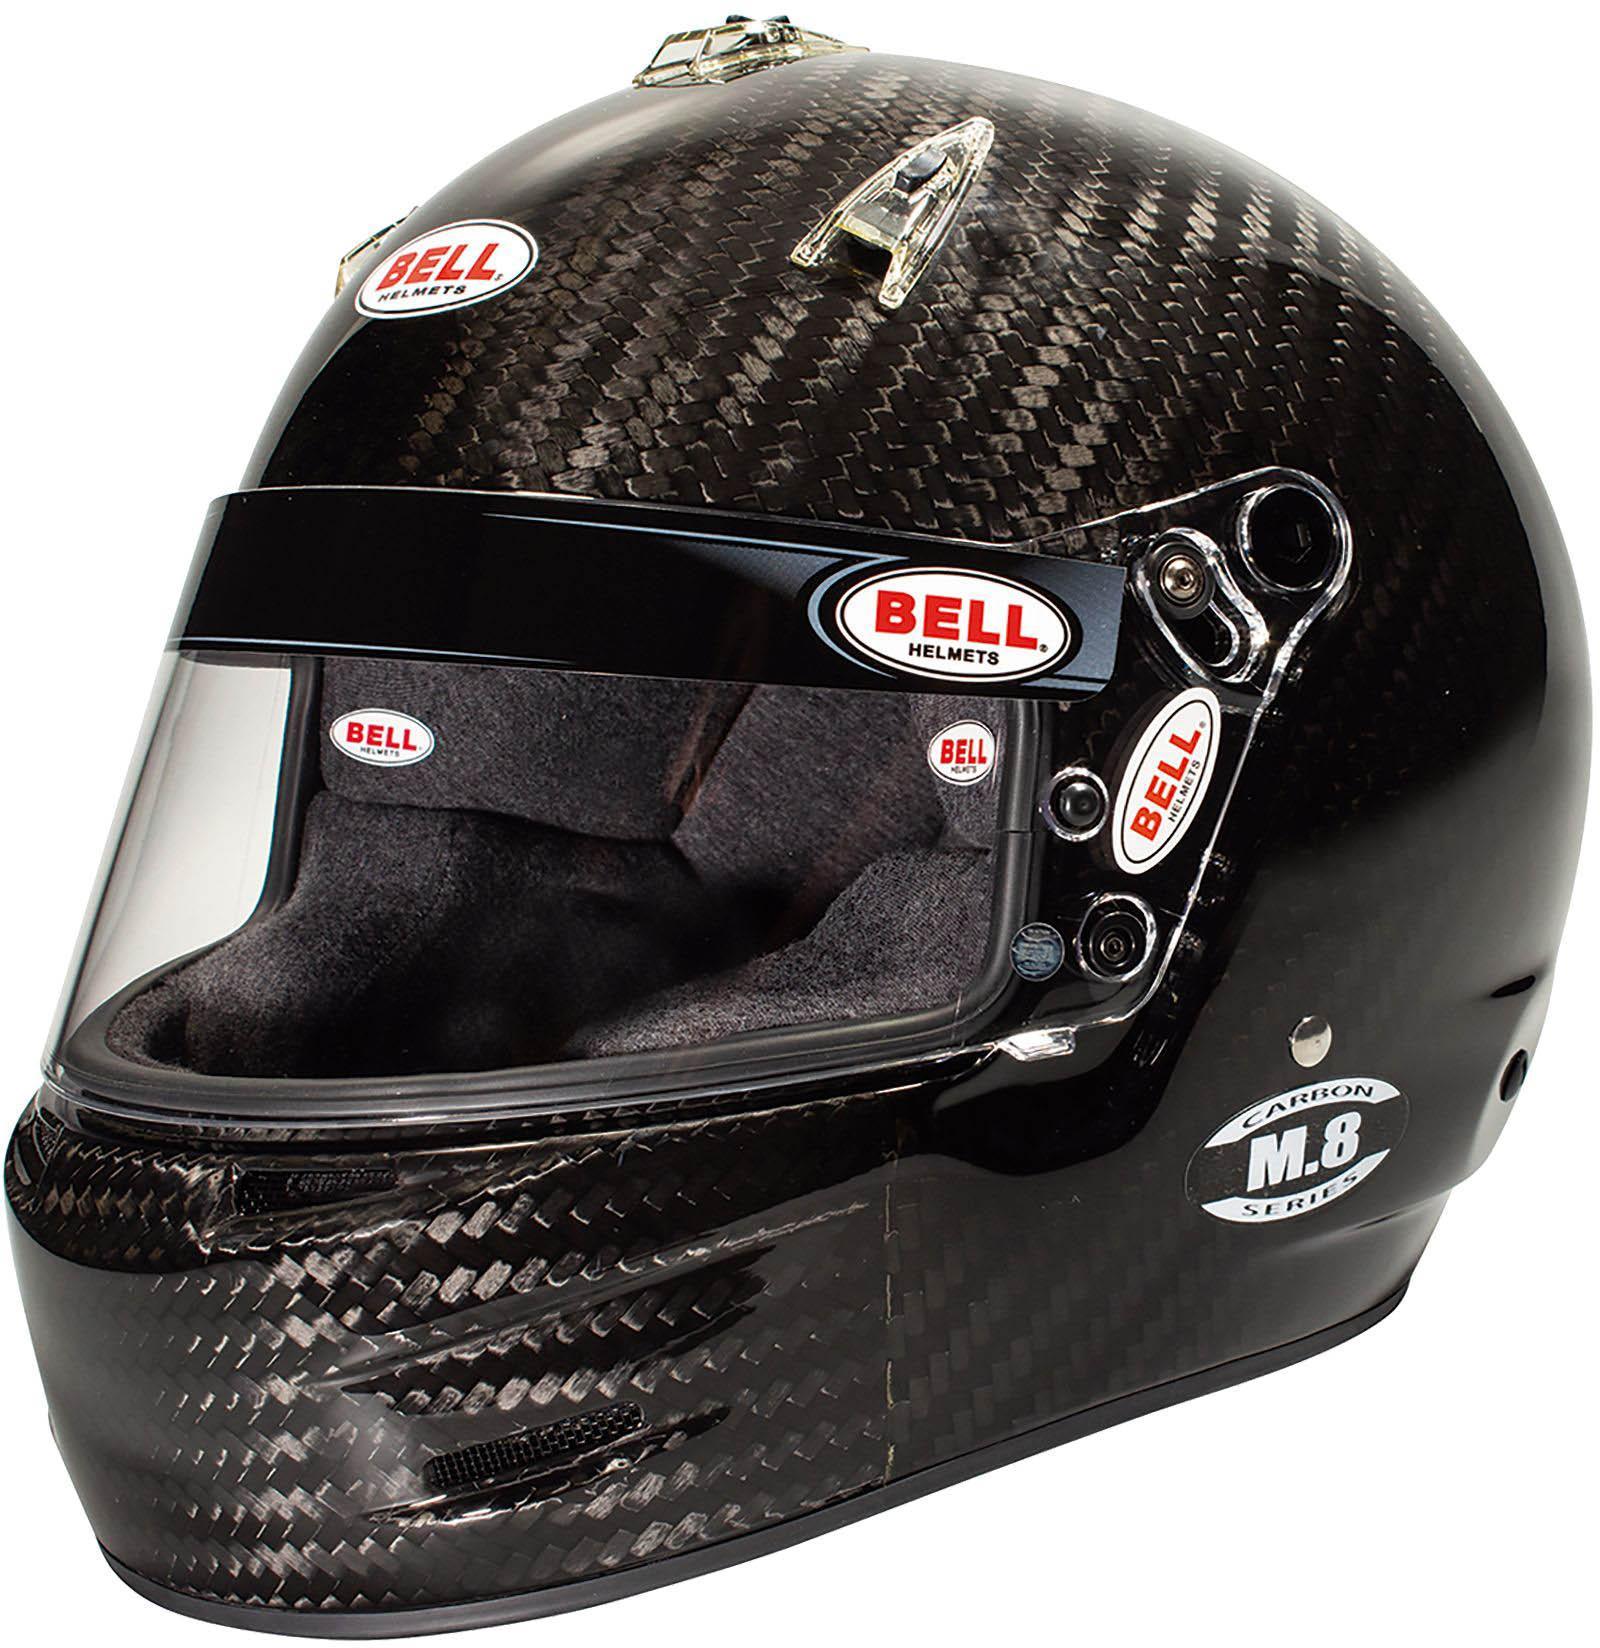 Bell M8 Carbon Helmet SA2020